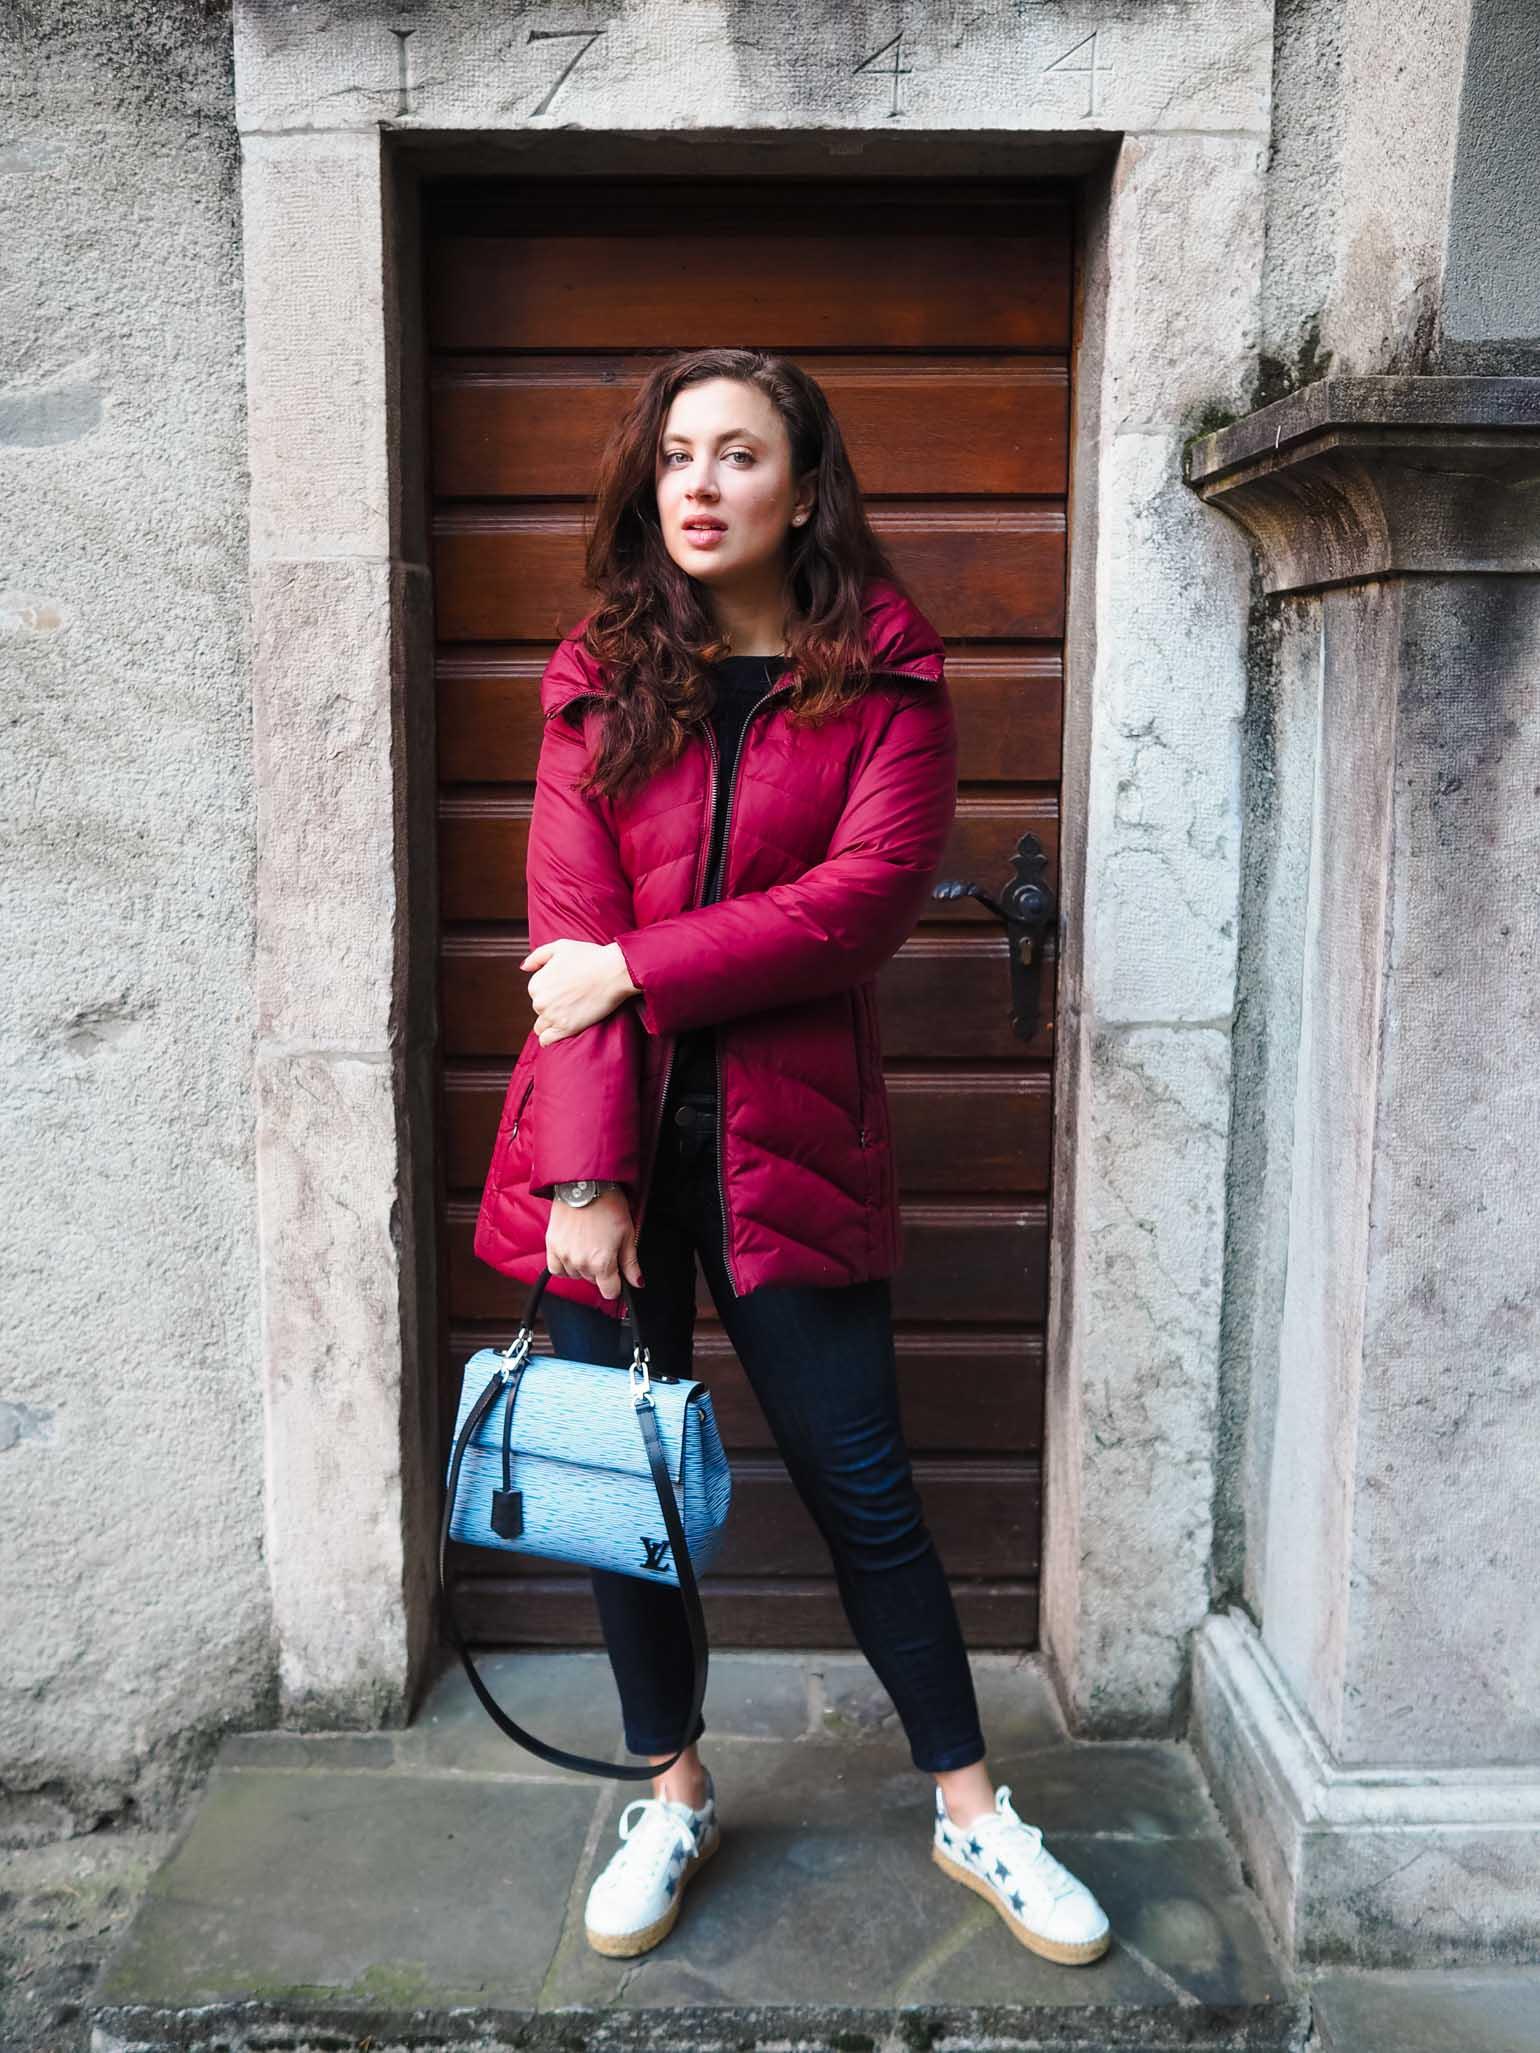 Luxury Handbag Review: Louis Vuitton Cluny BB - The Brunette Nomad, Dallas Fashion Blogger